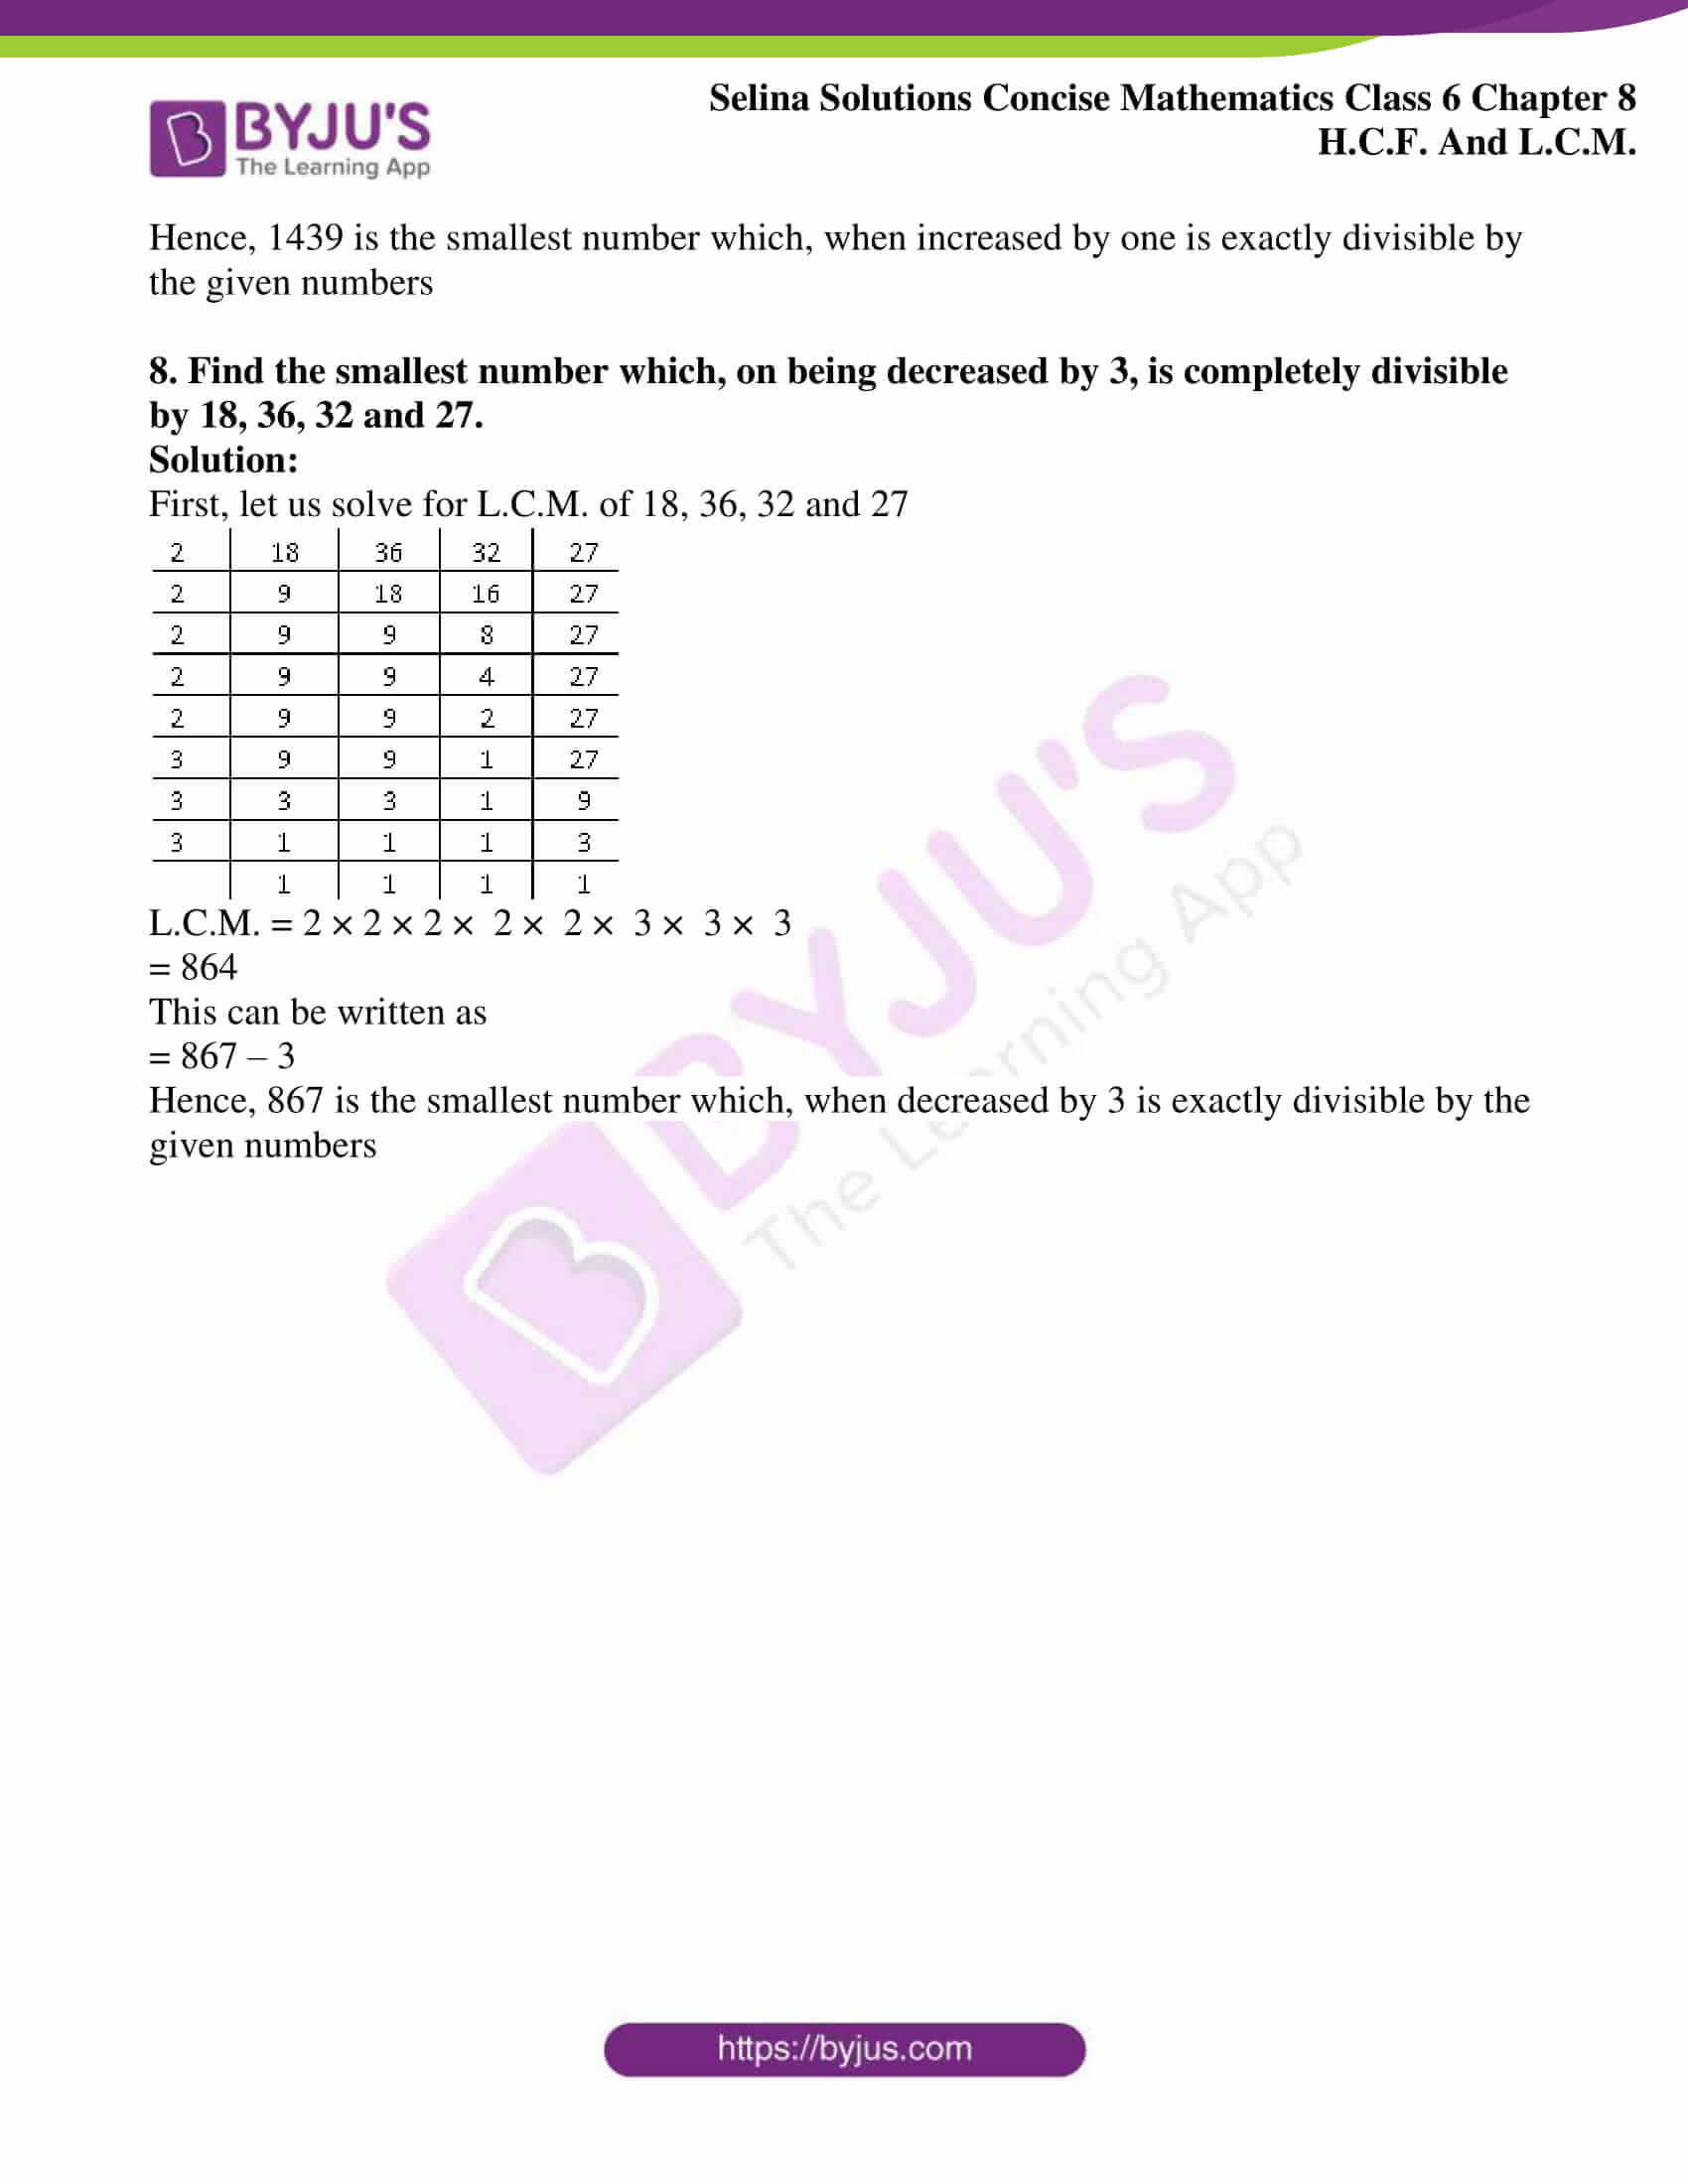 selina sol concise mathematics class 6 ch 8 ex c 6